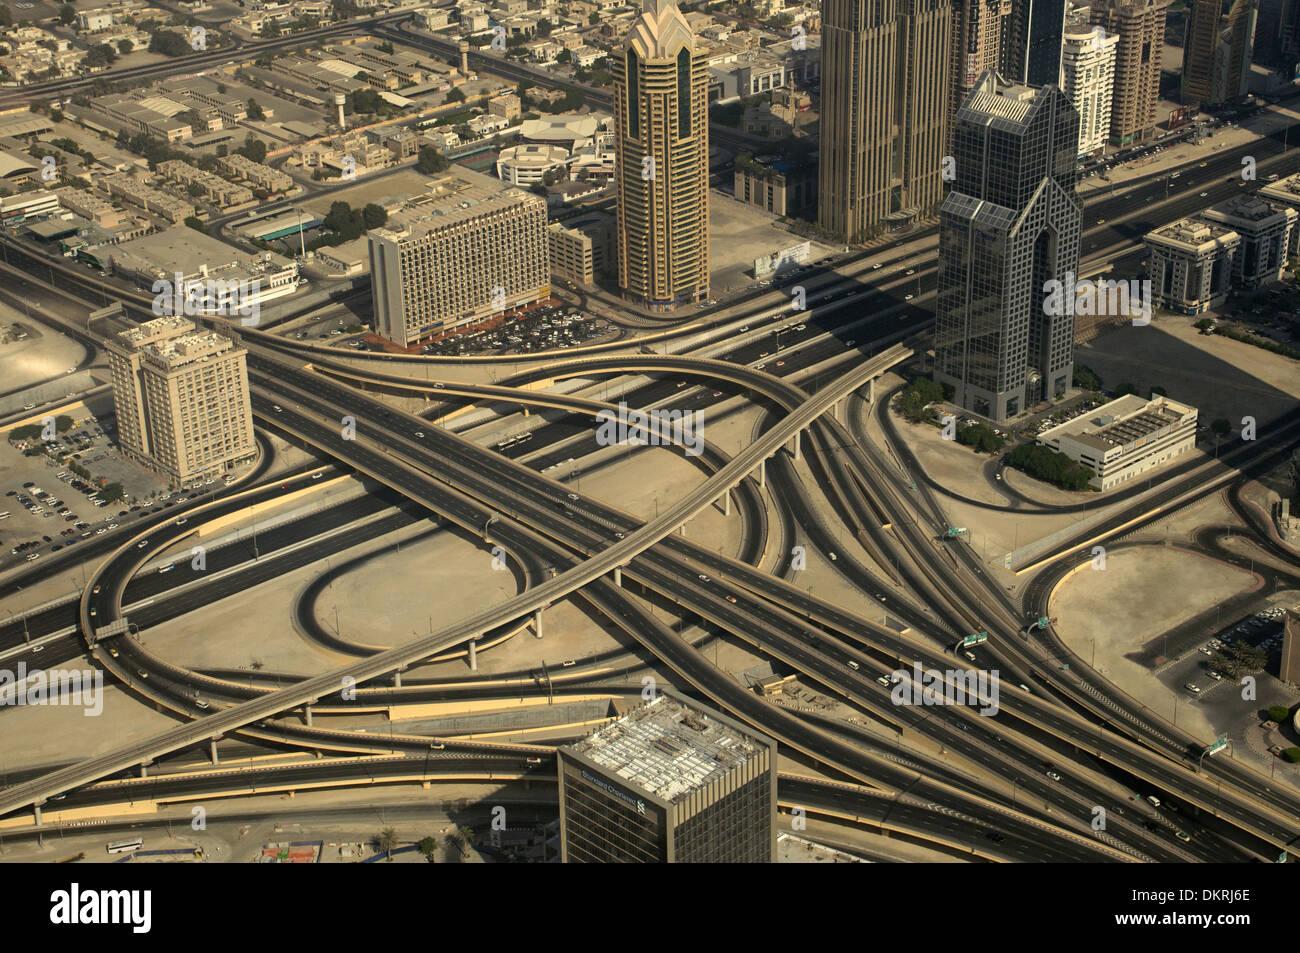 Dubai city a view from observation deck of Burj Khalifa. Dubai UAE - Stock Image